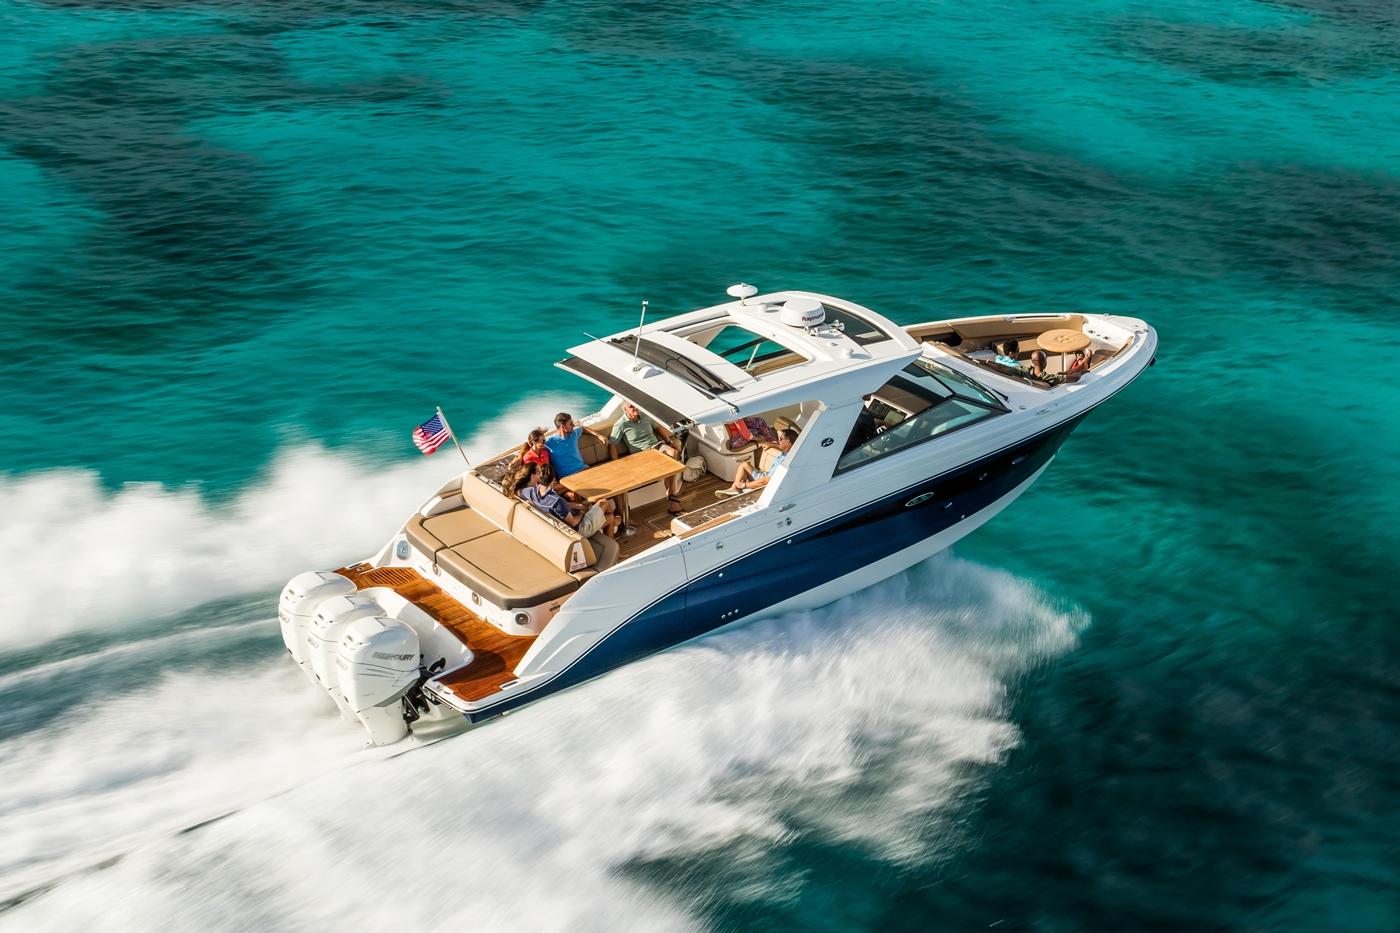 Orillia Boat Tours